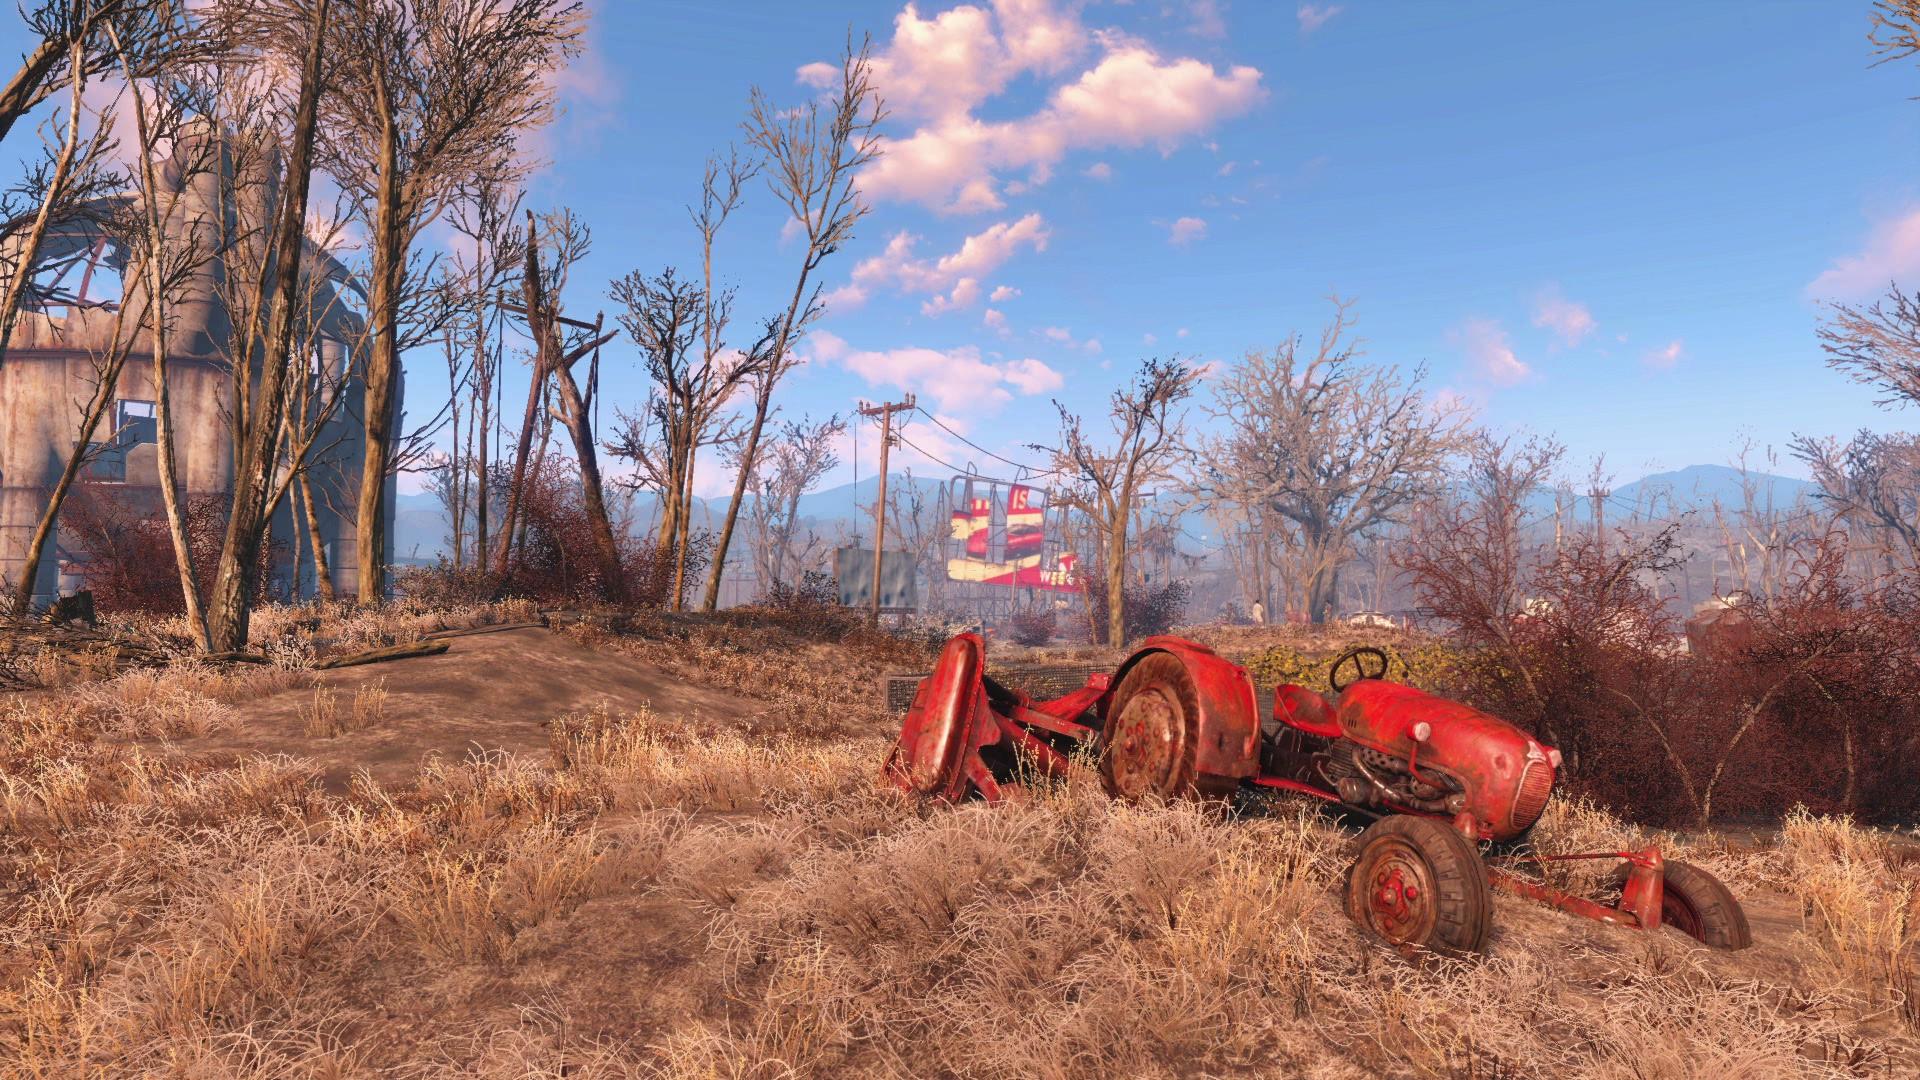 Wallpaper : video games, field, farm, Fallout 4, tree, autumn